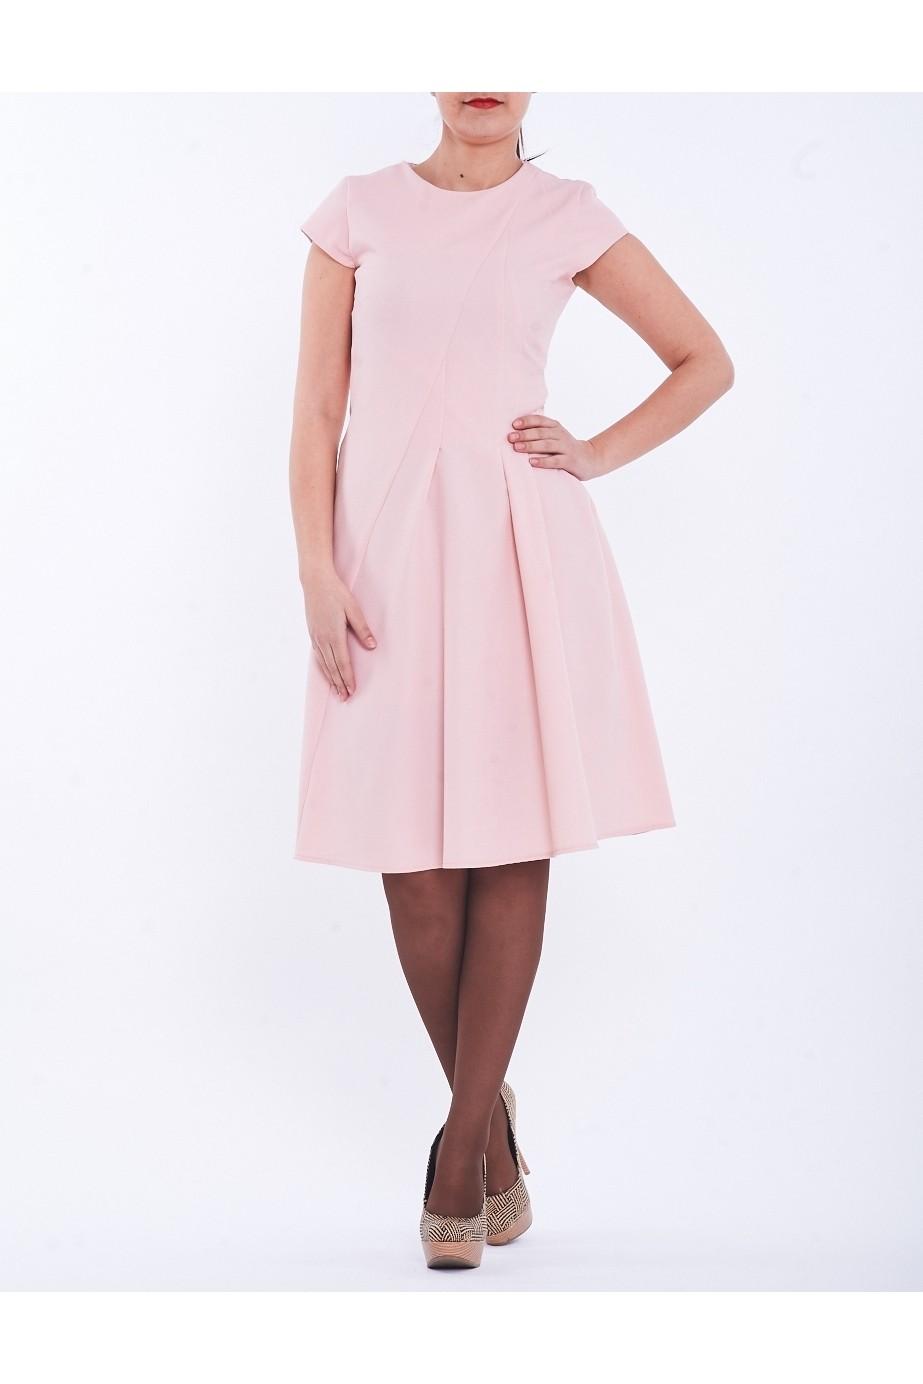 Rochie roz pal cu pliuri pe partea stanga TinaR 38